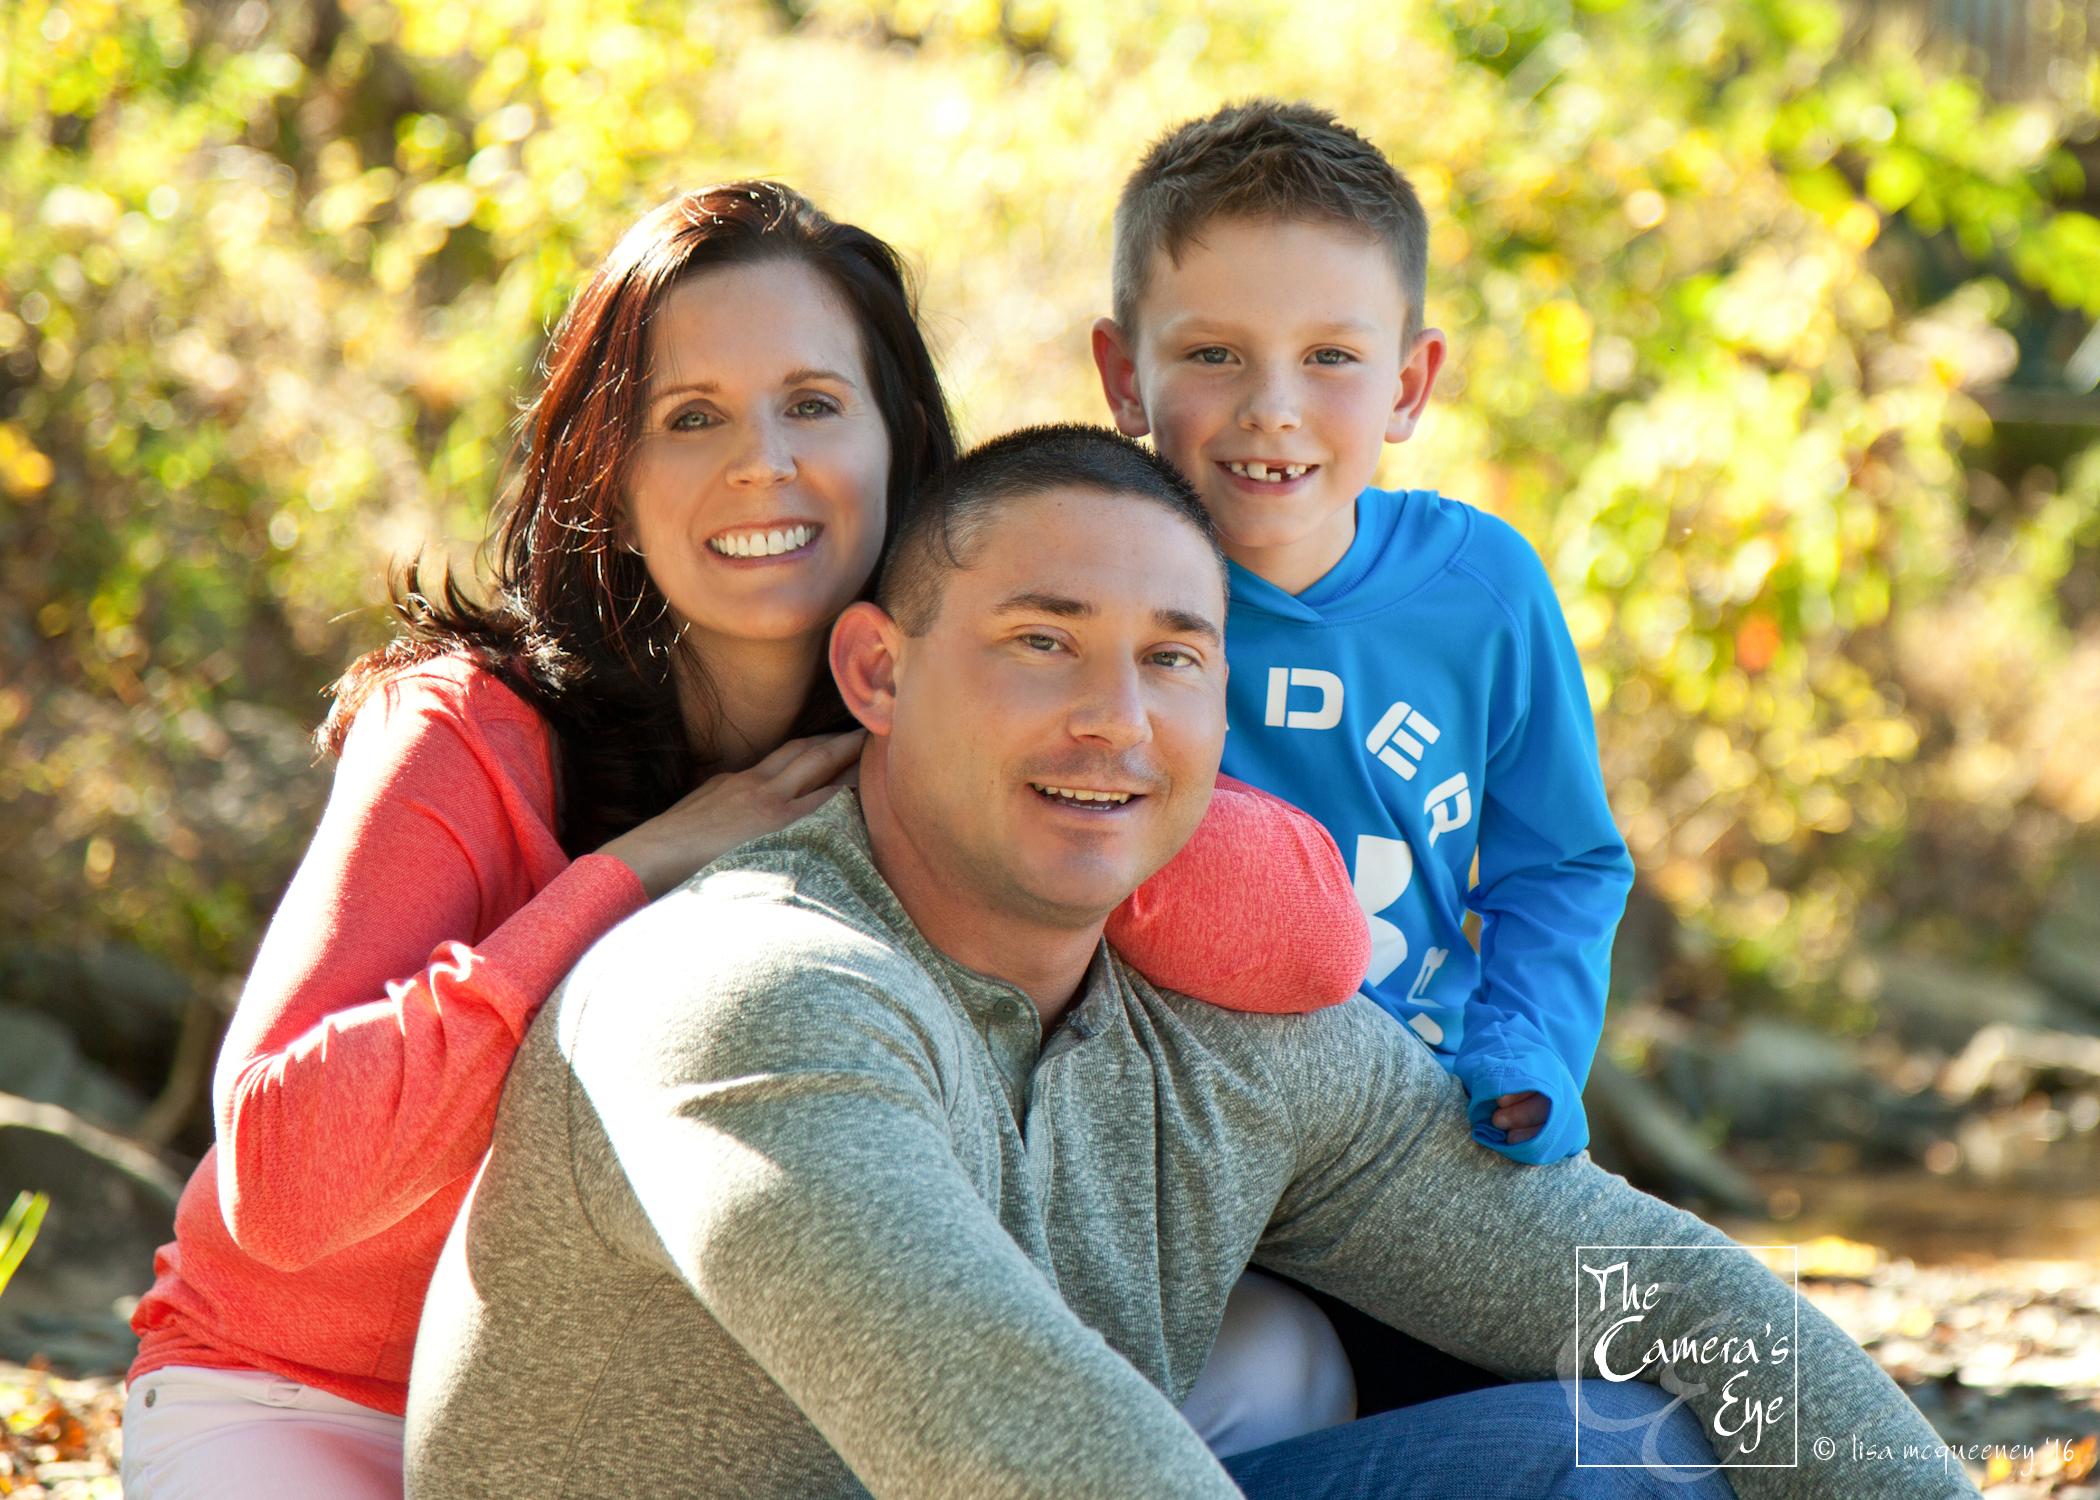 Family Portraits, The CamerasEye